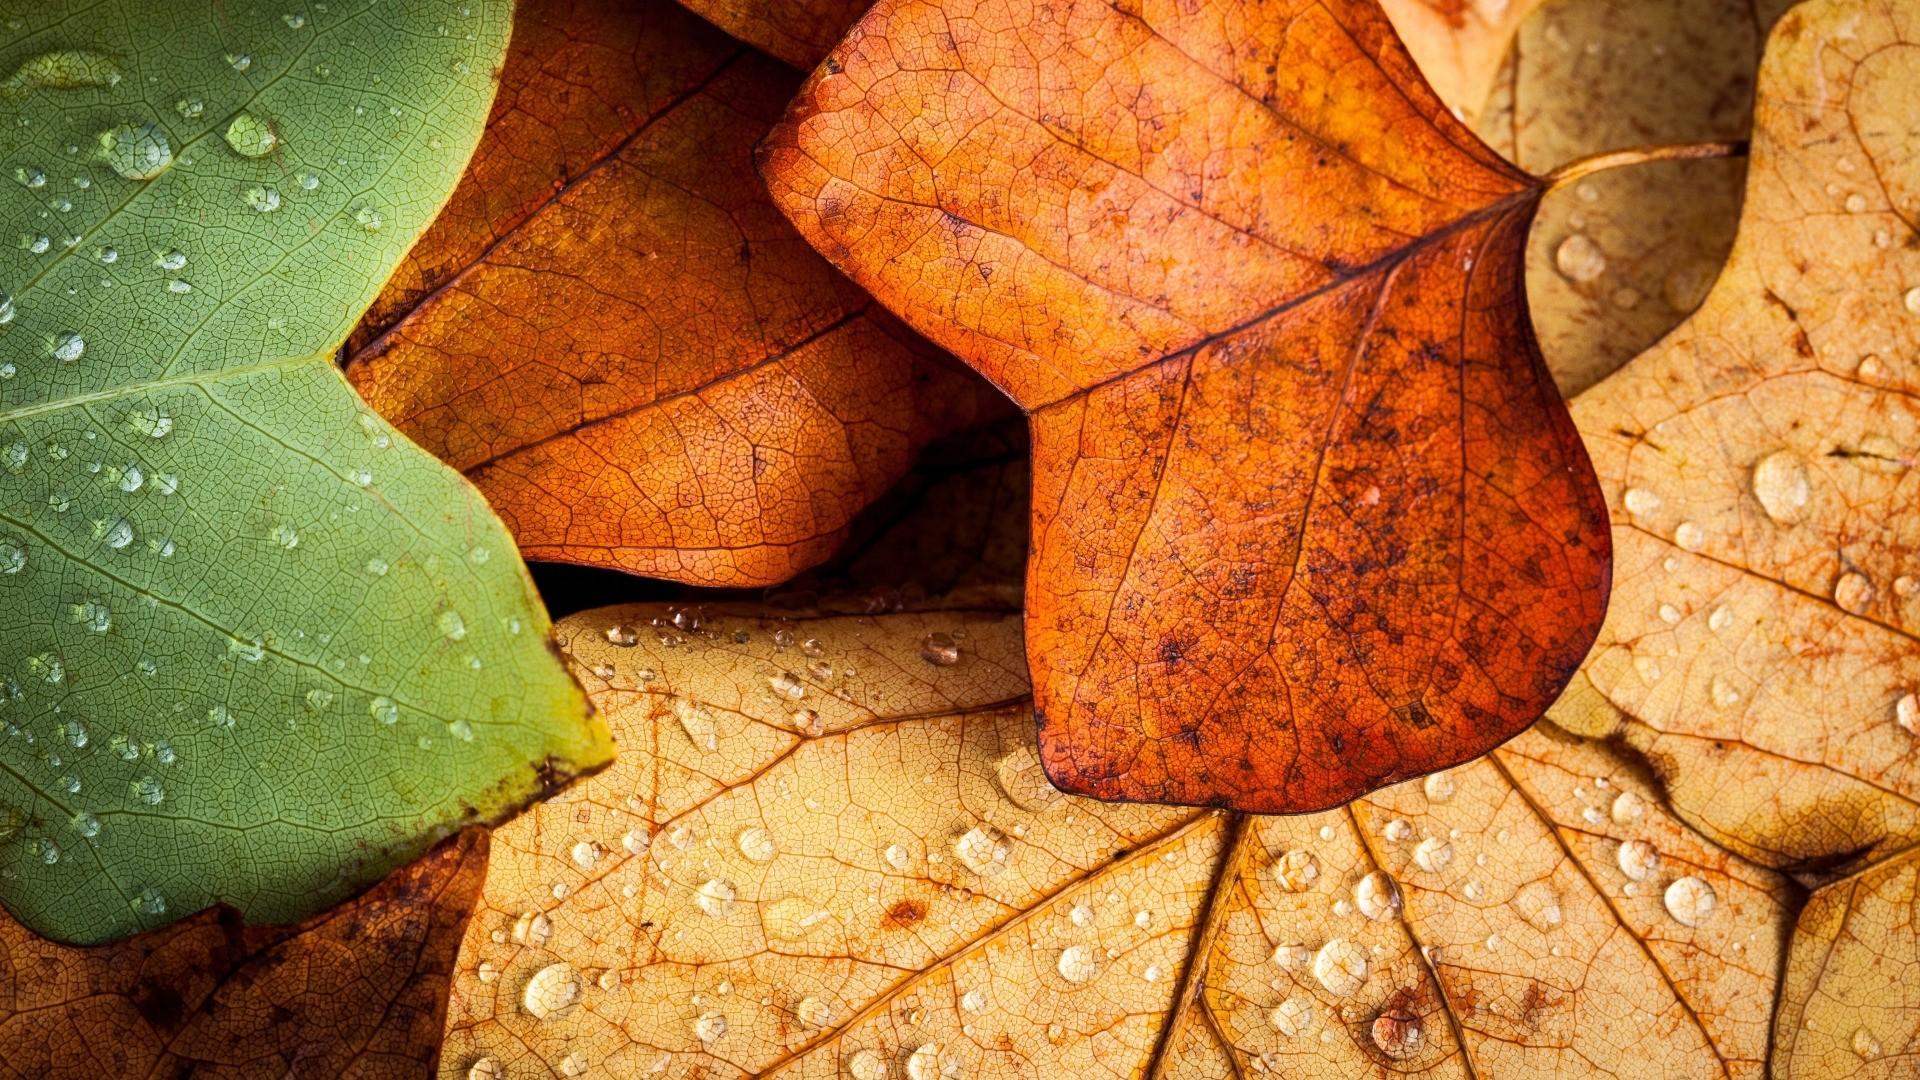 Fall Leaves wallpaper photo hd